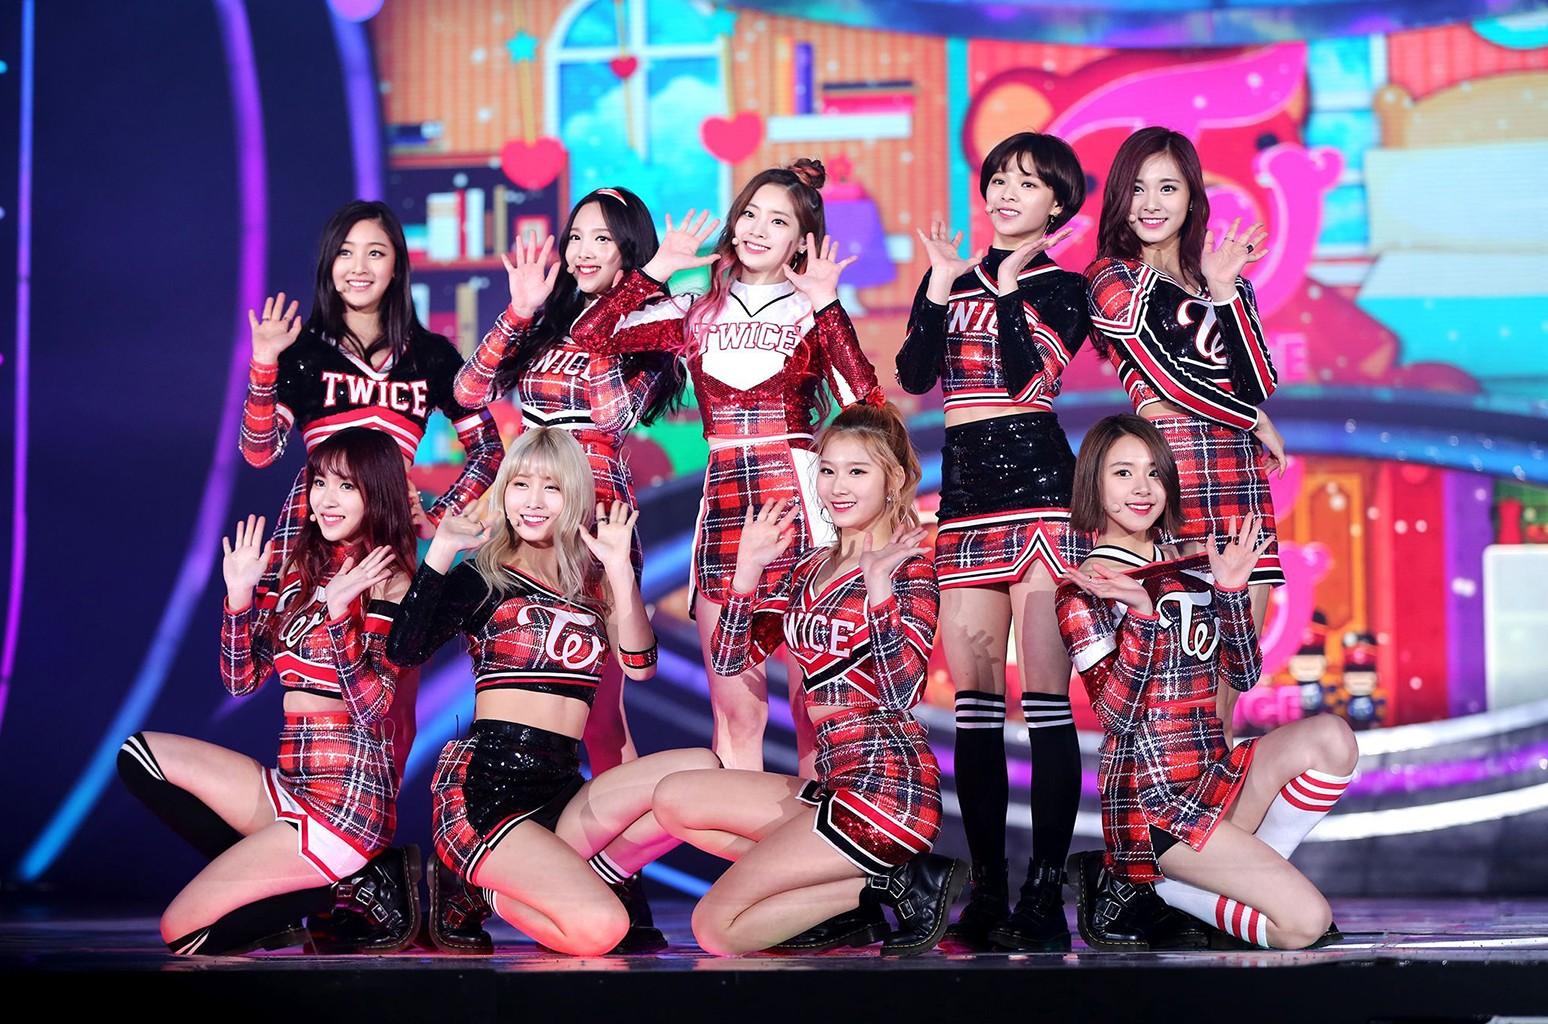 Twice perform in Seoul